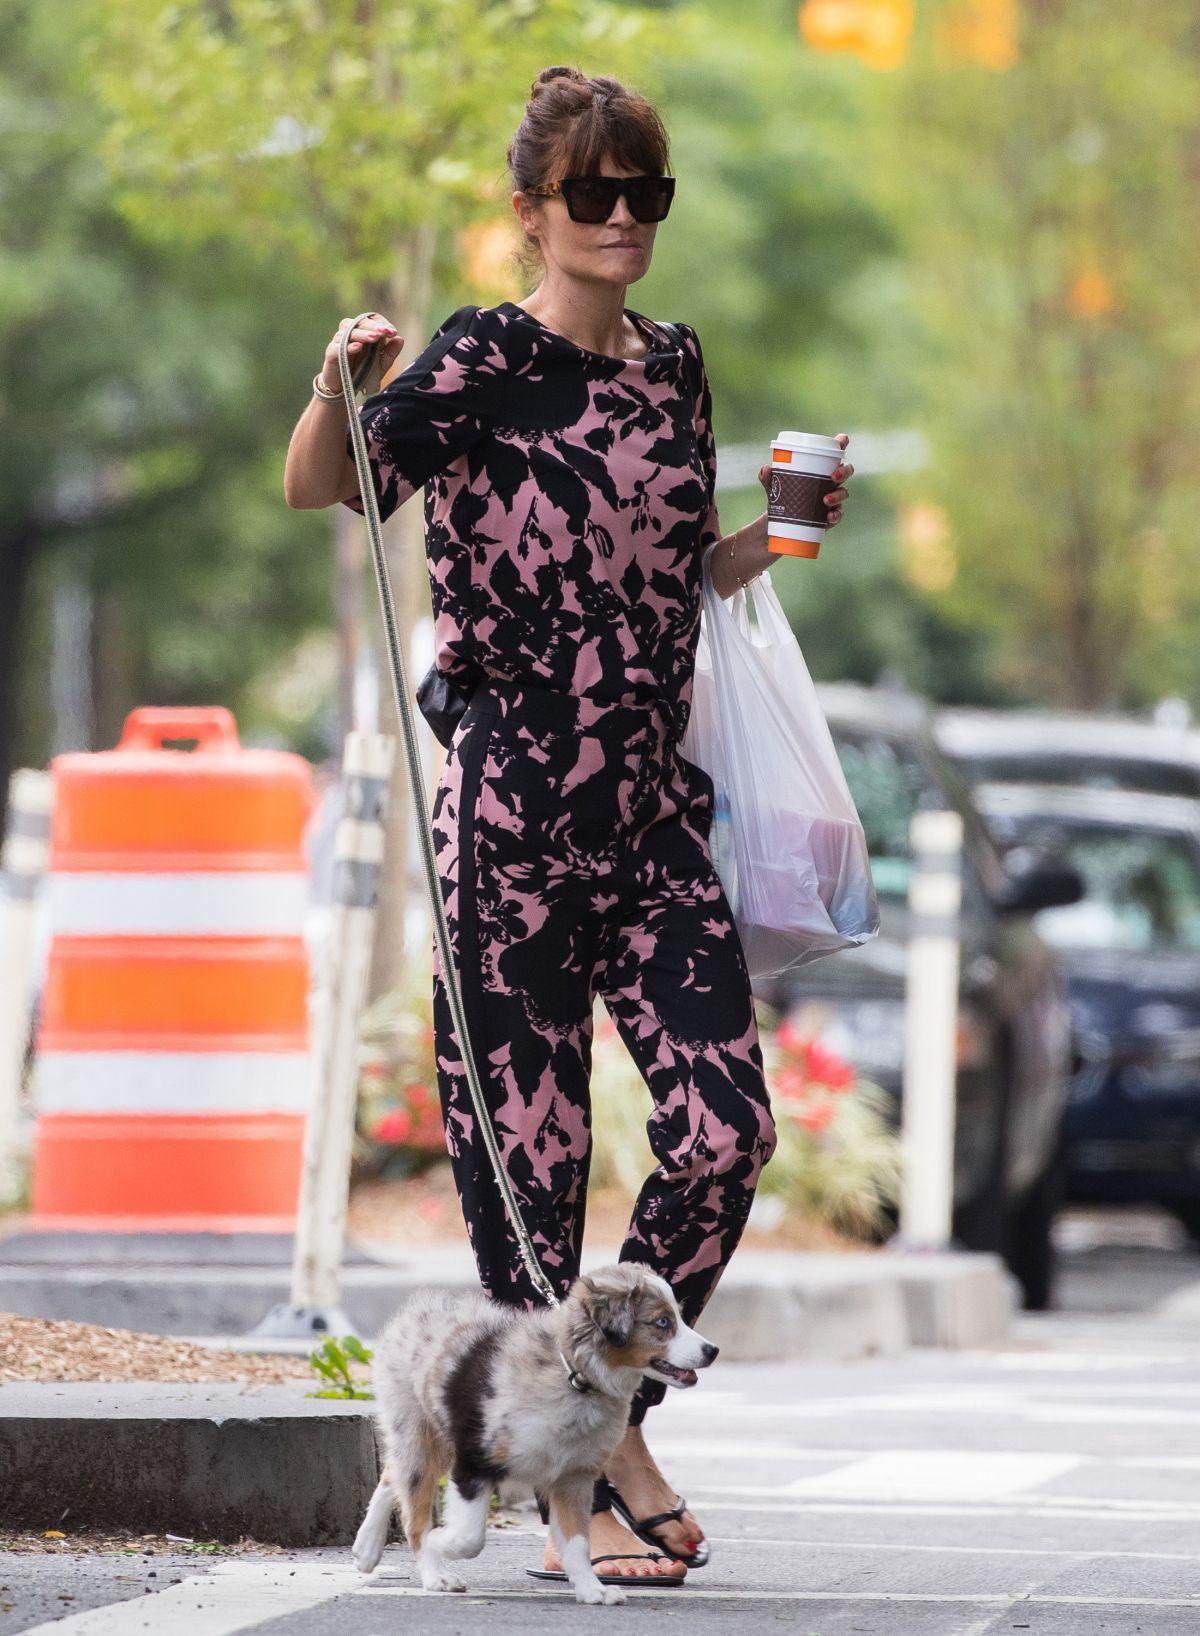 HELENA CHRISTENSEN Walks Her Dog Out in New York 06/13/2016